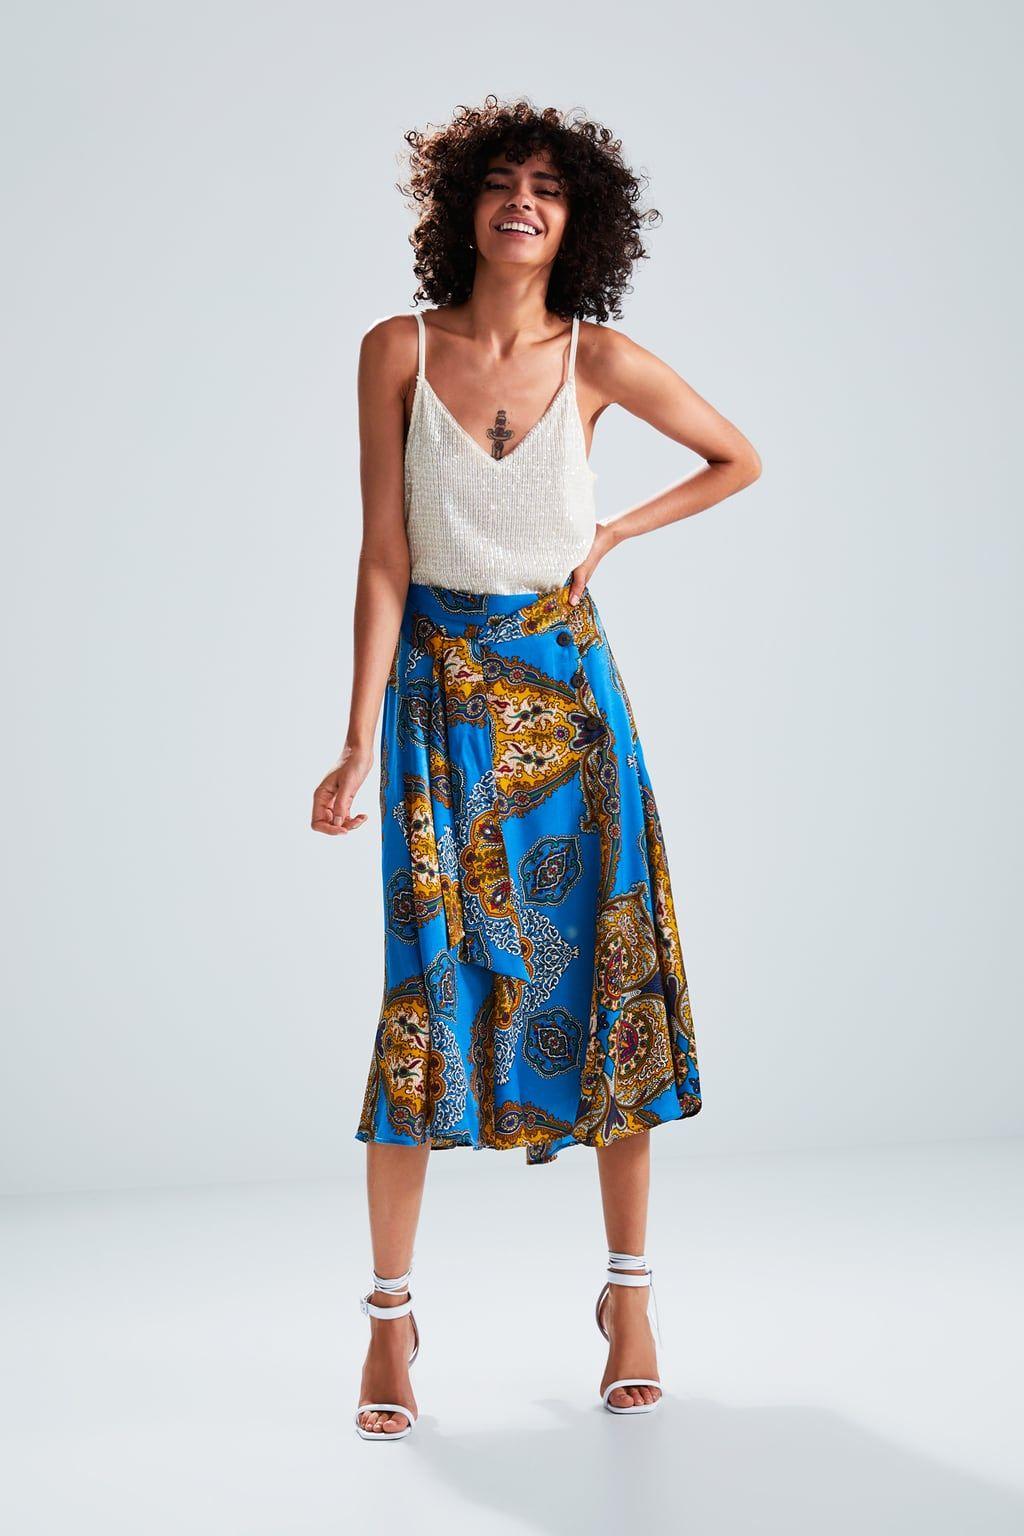 83572b9b6 Printed skirt in 2019 | Zara | Printed skirts, Skirts, Flowy skirt